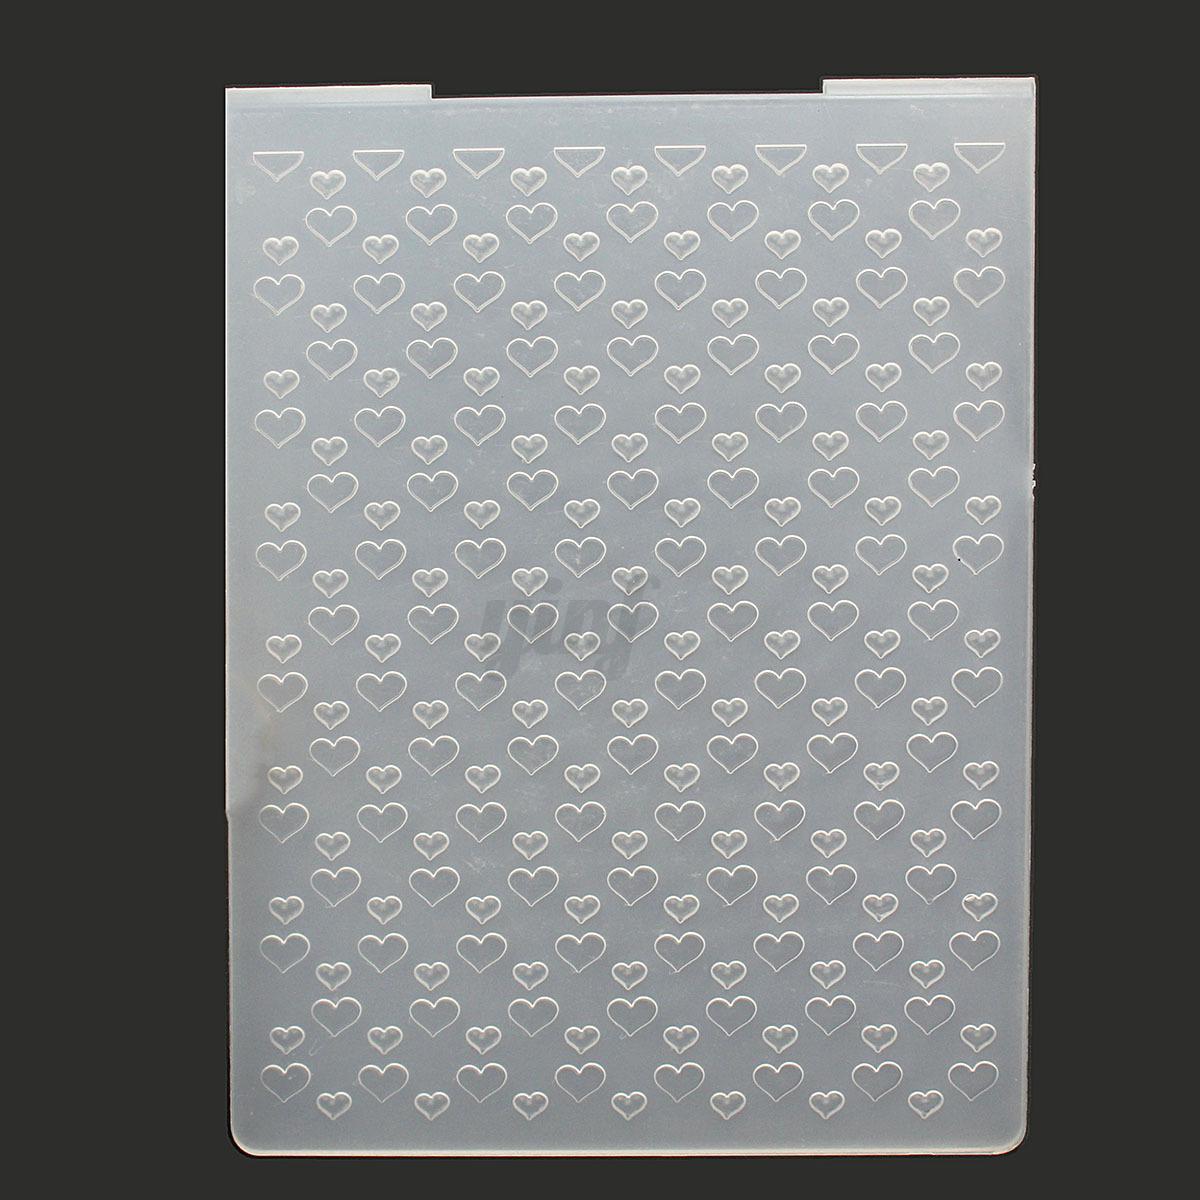 Plastic Embossing Folder DIY Scrapbooking Album Card Cutting Dies ...